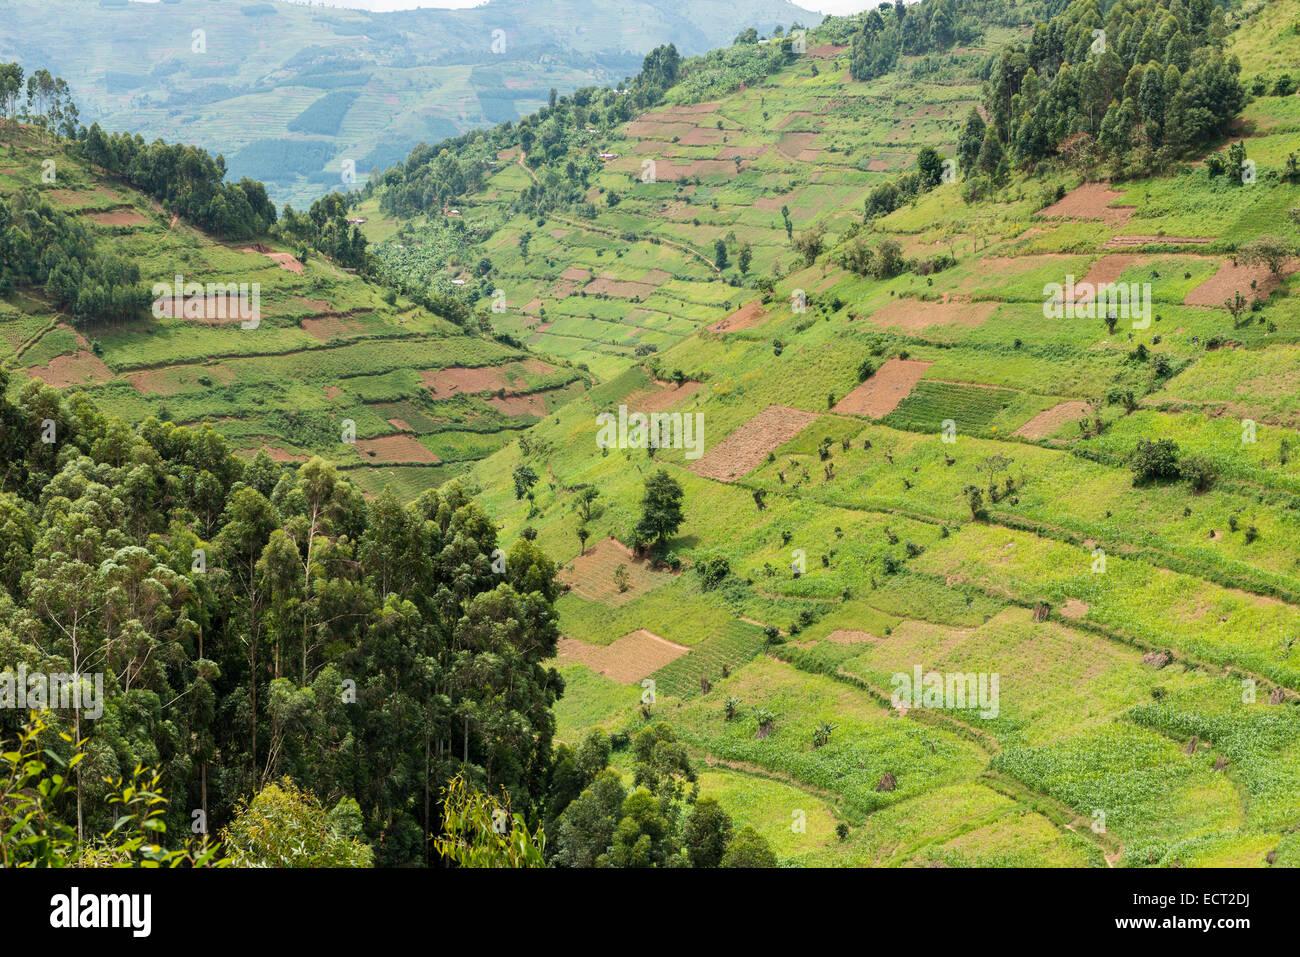 Cultivated fields on slopes, Uganda - Stock Image